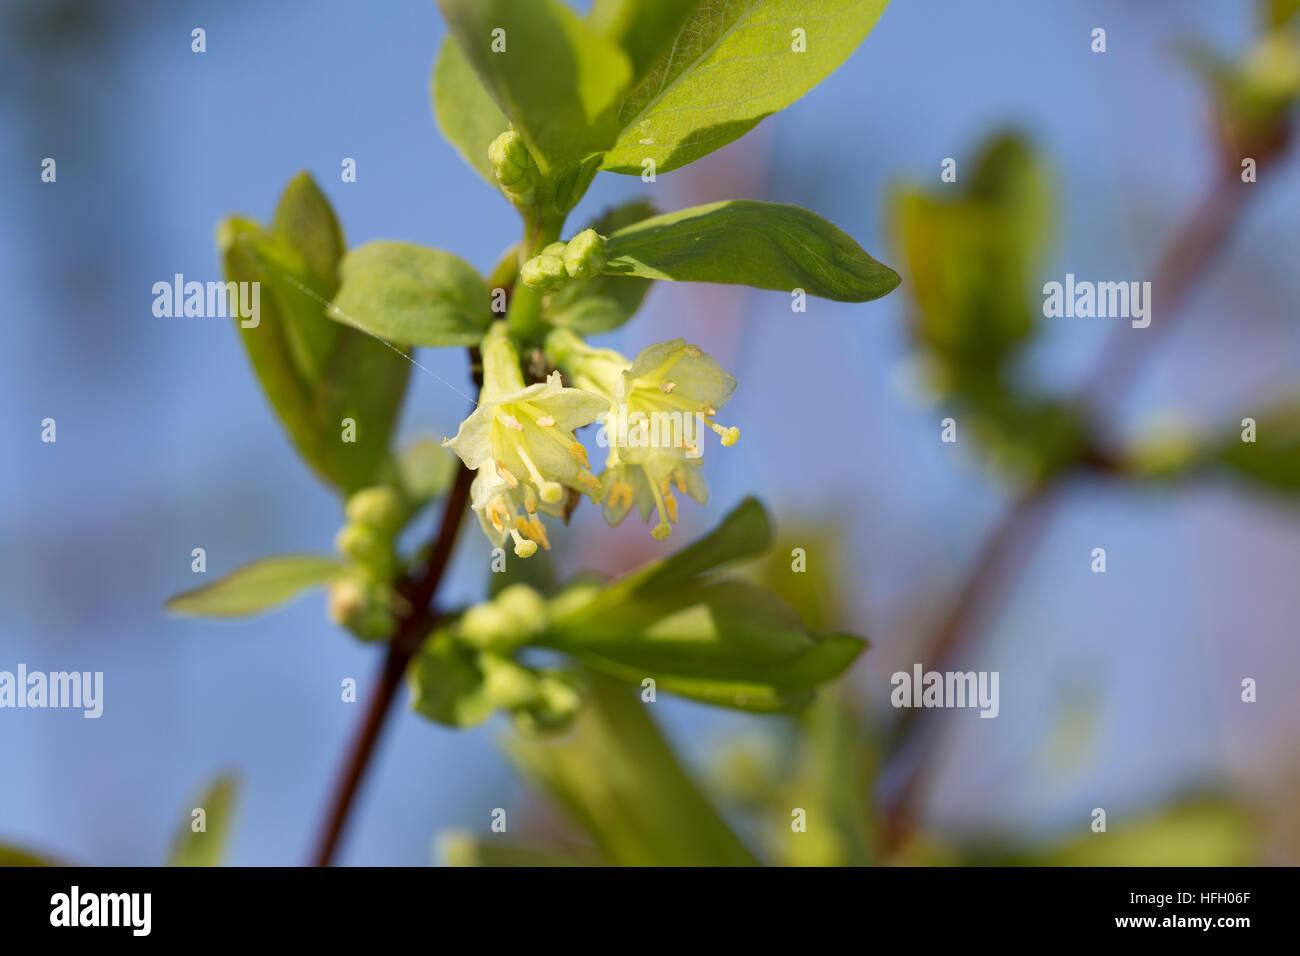 Blaue Heckenkirsche, Blaue Doppelbeere, Lonicera caerulea, Blue-berried Honeysuckle, Sweetberry Honeysuckle - Stock Image